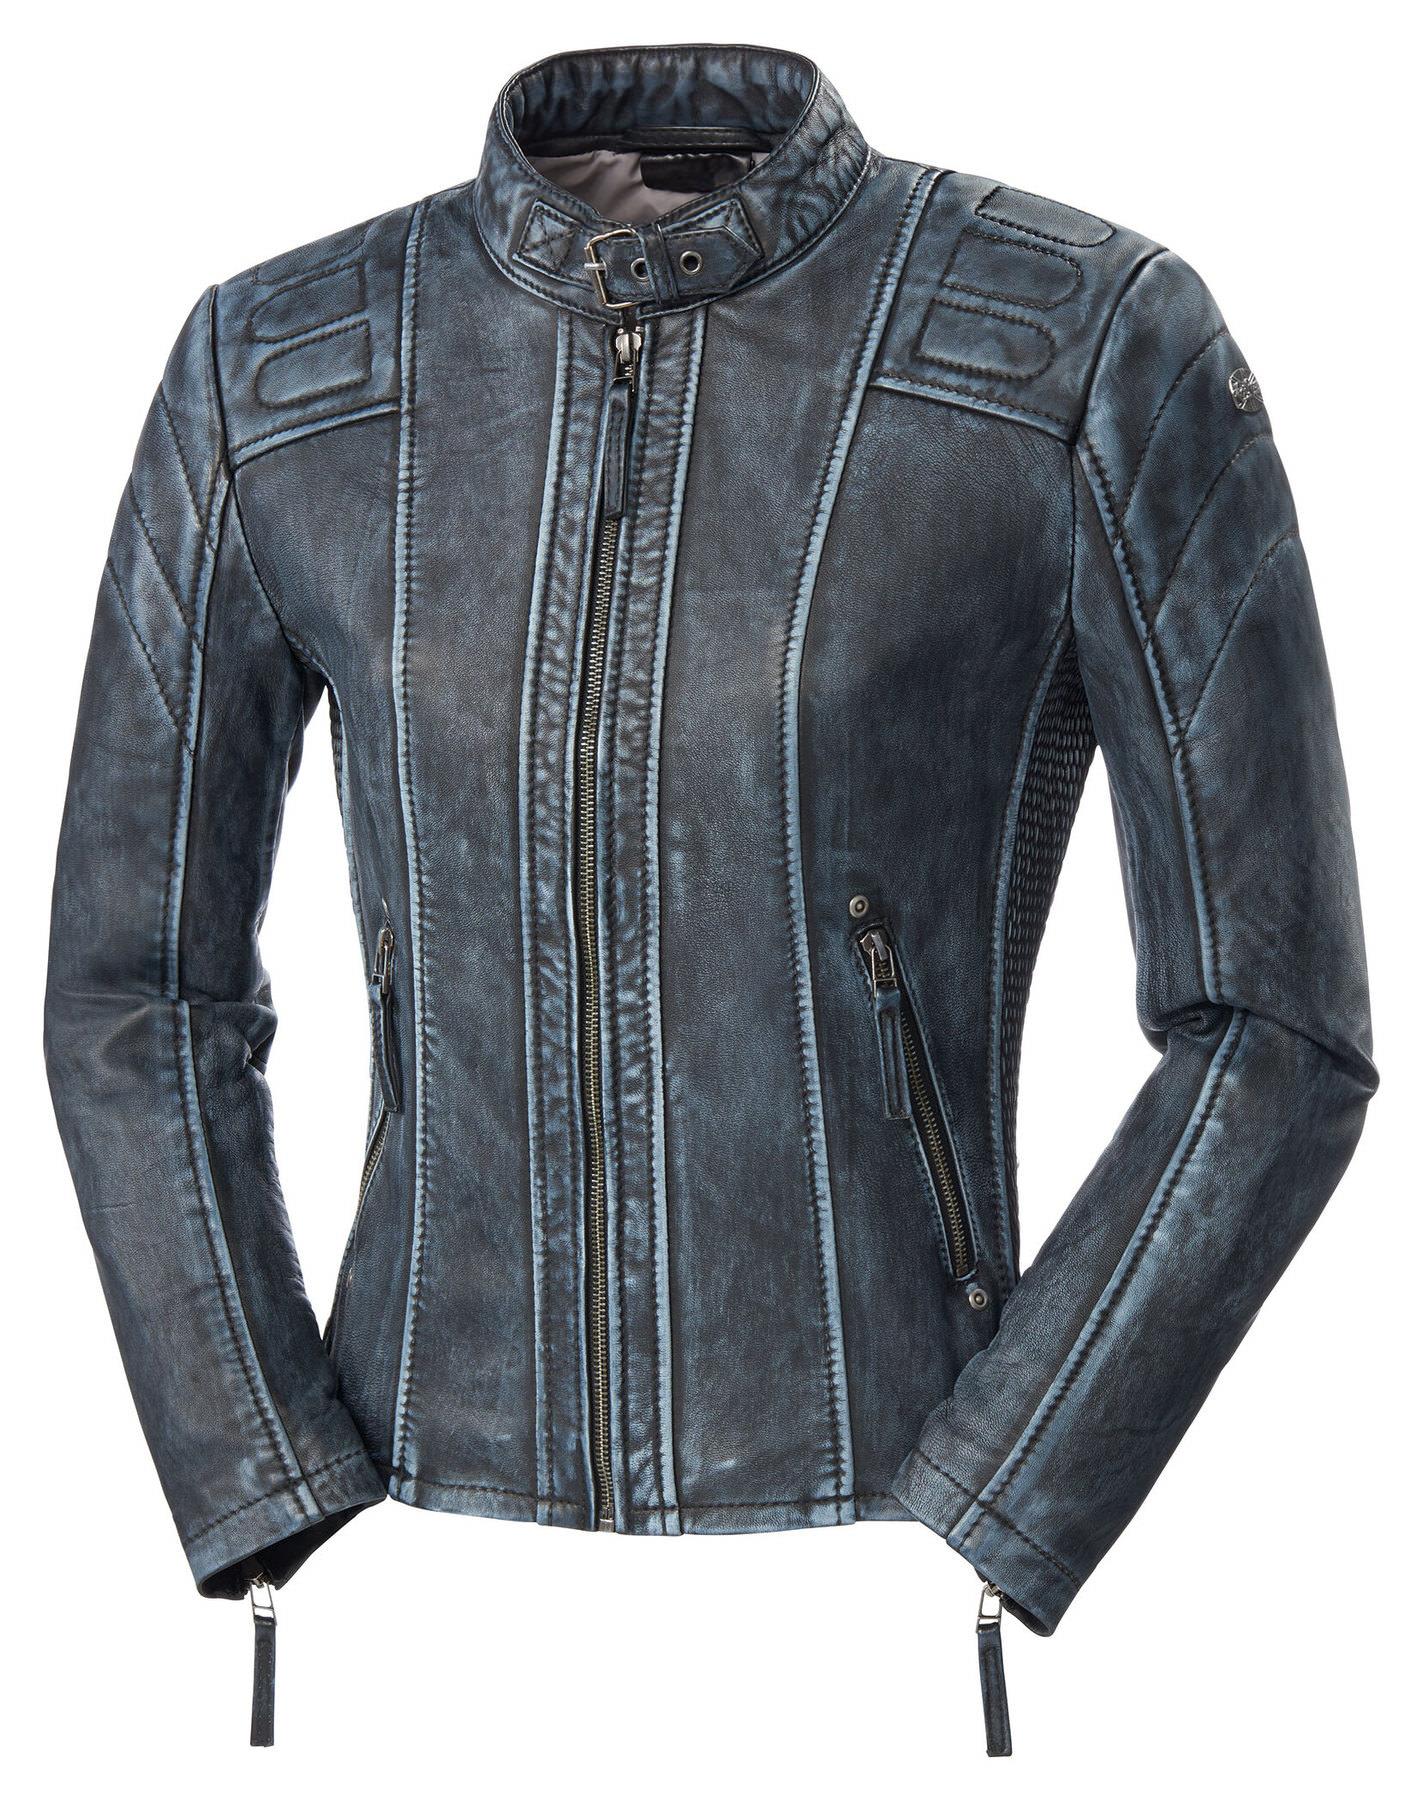 Buy Cafe Racer Fashion Iv Lady Leath Jacket Louis Motorcycle Clothing And Technology